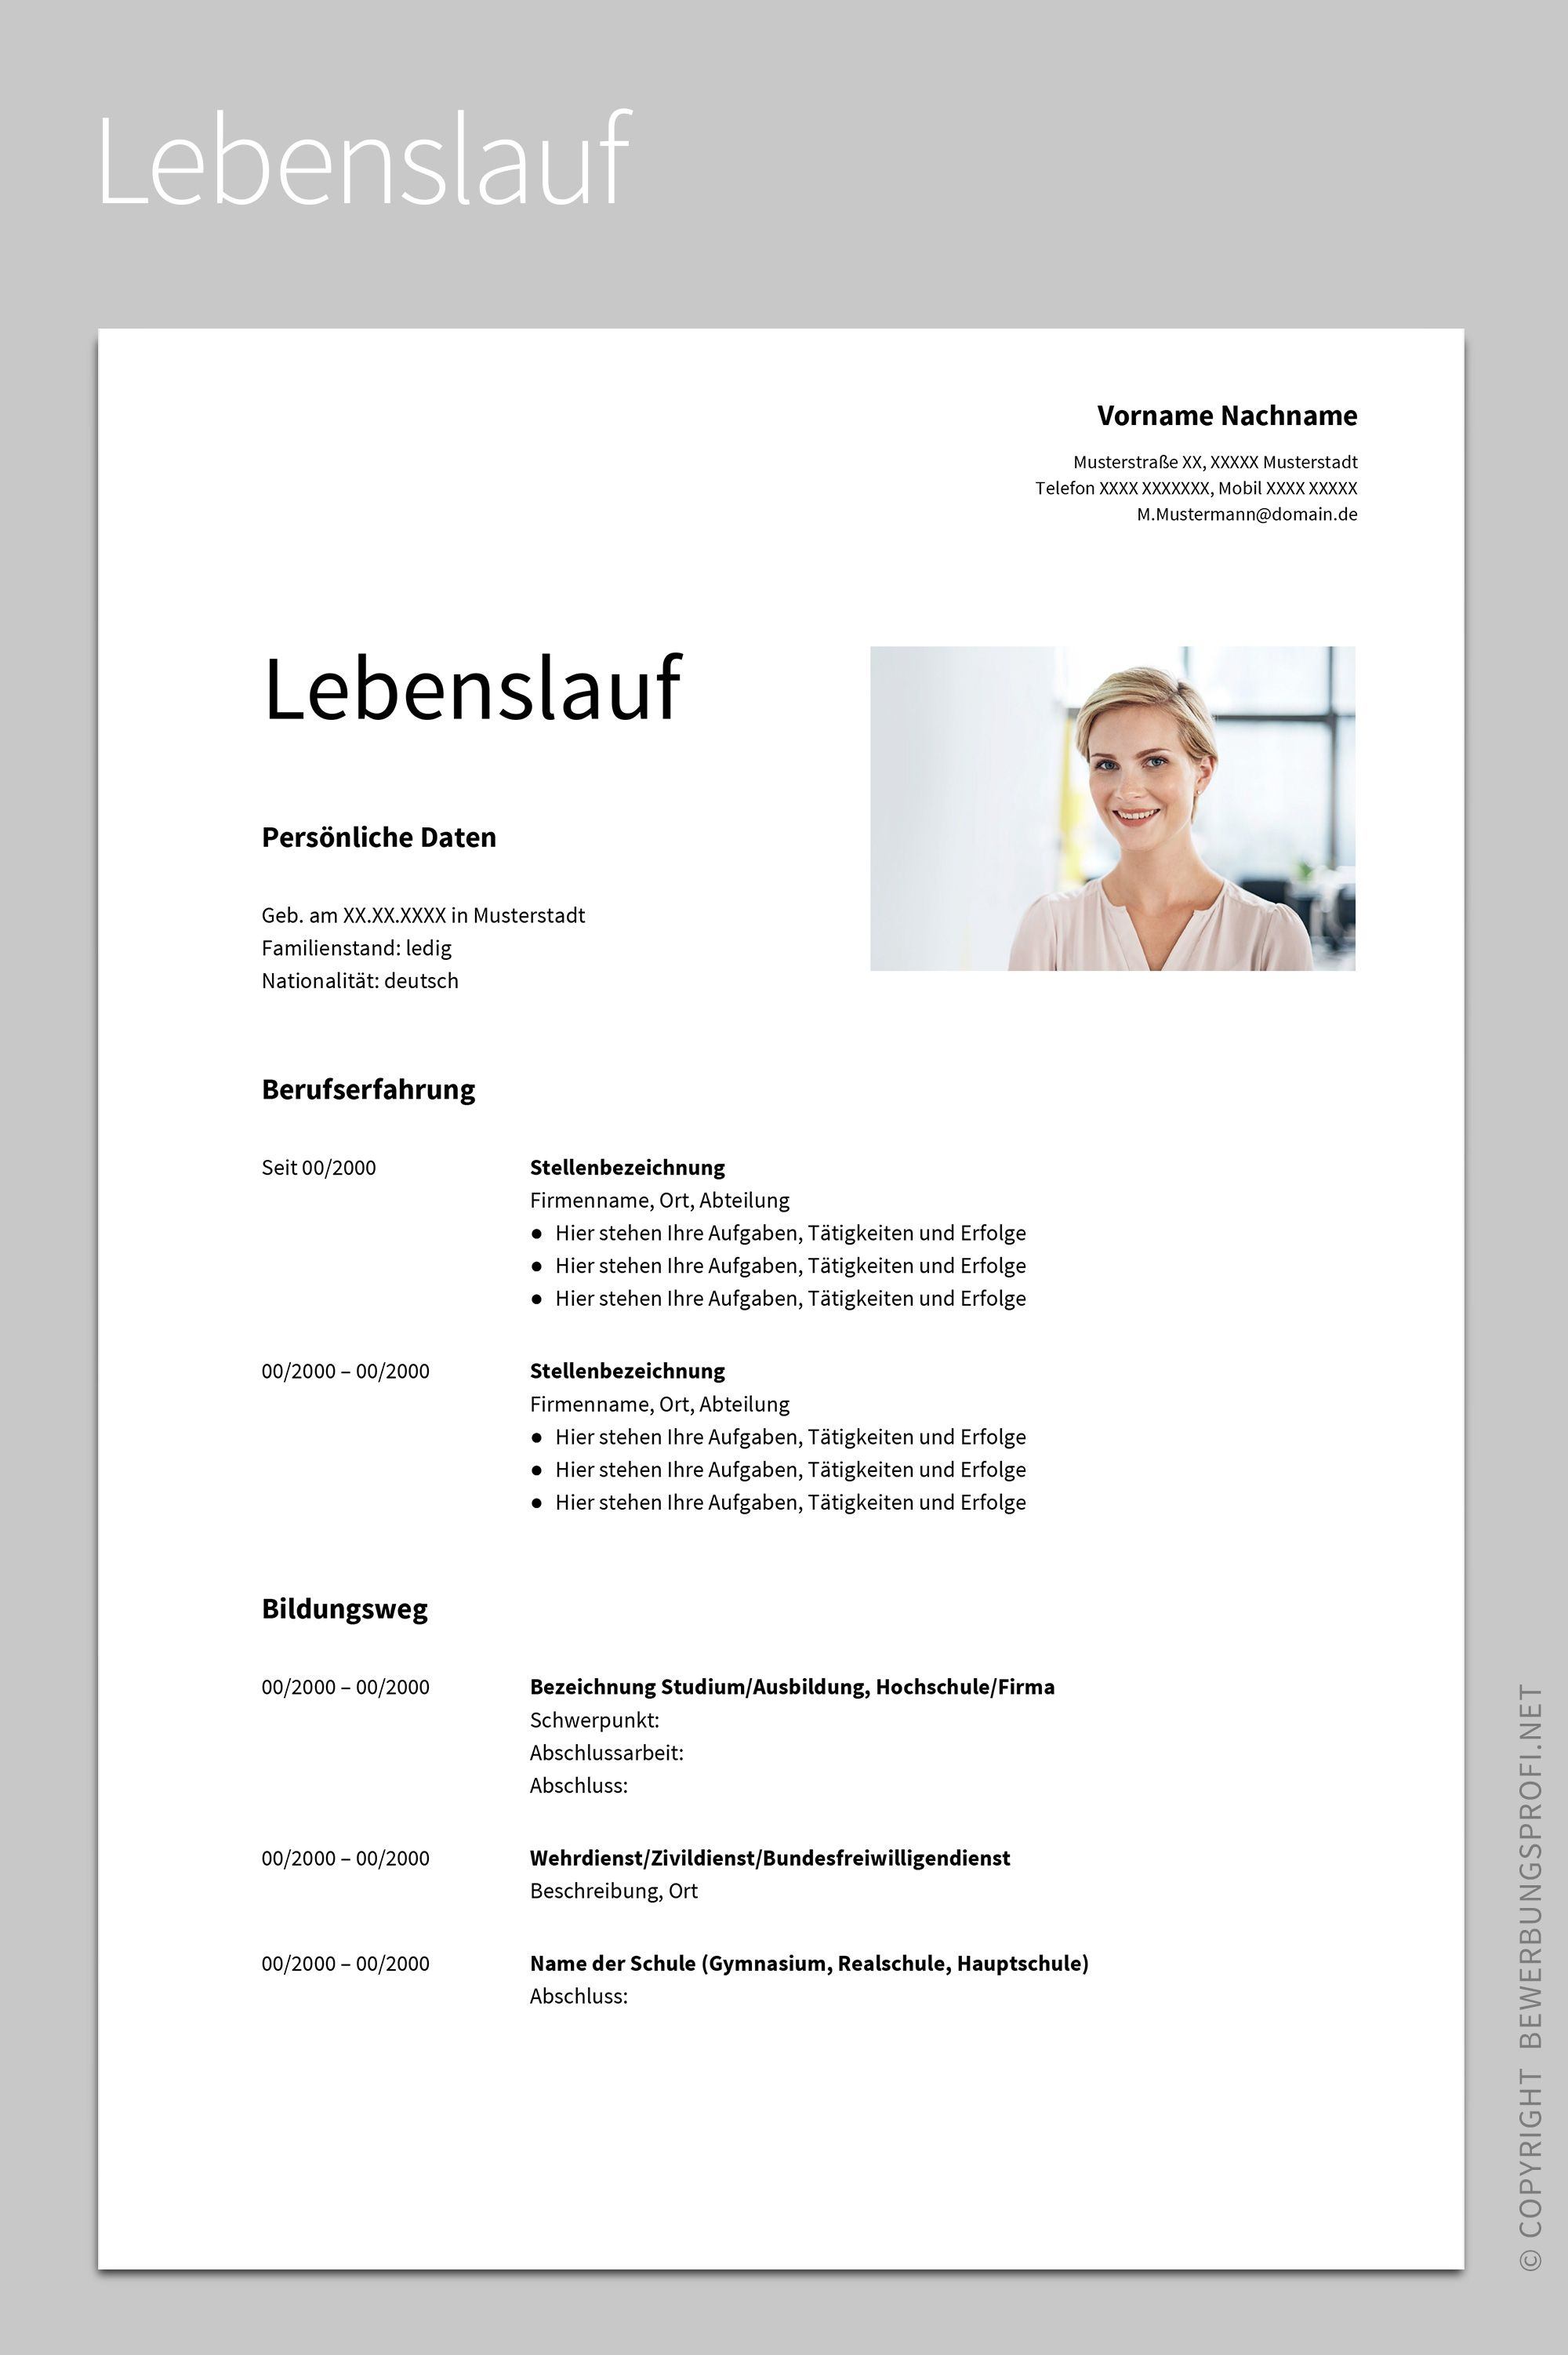 30 Lebenslauf Design Vorlage Download Lebenslauf Bewerbung Lebenslauf Vorlage Lebenslauf Design Vorlage